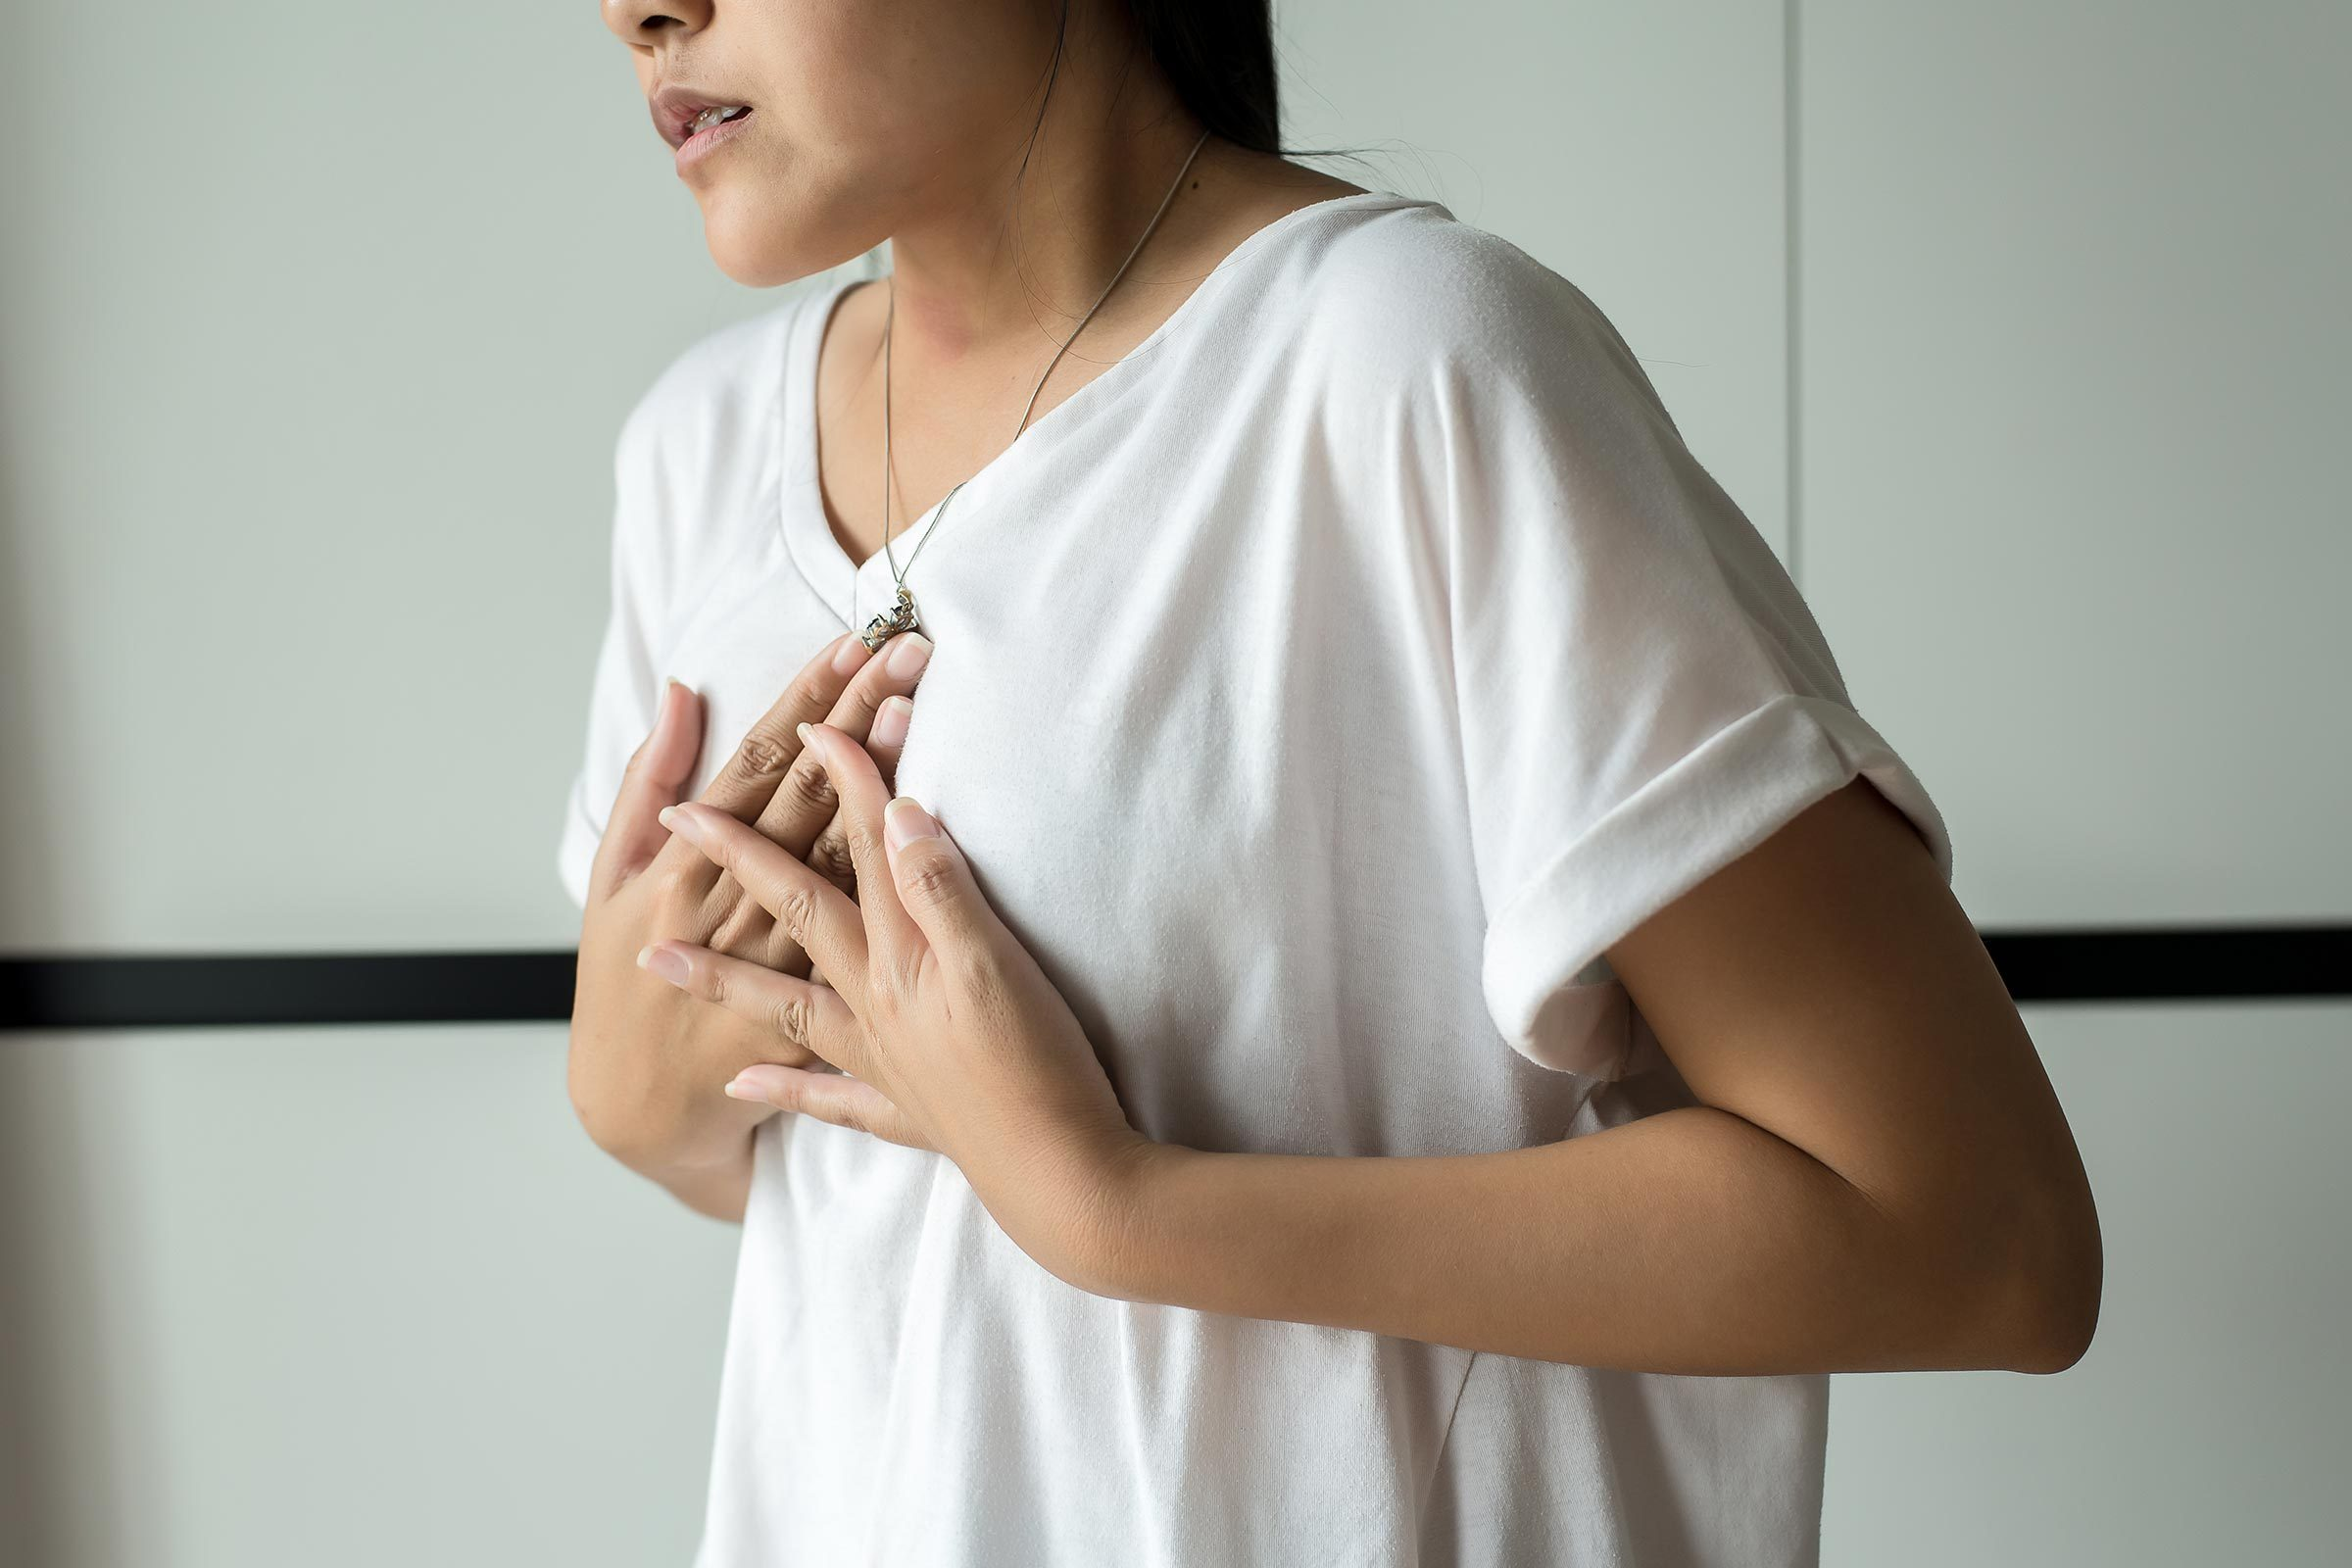 chest pain woman